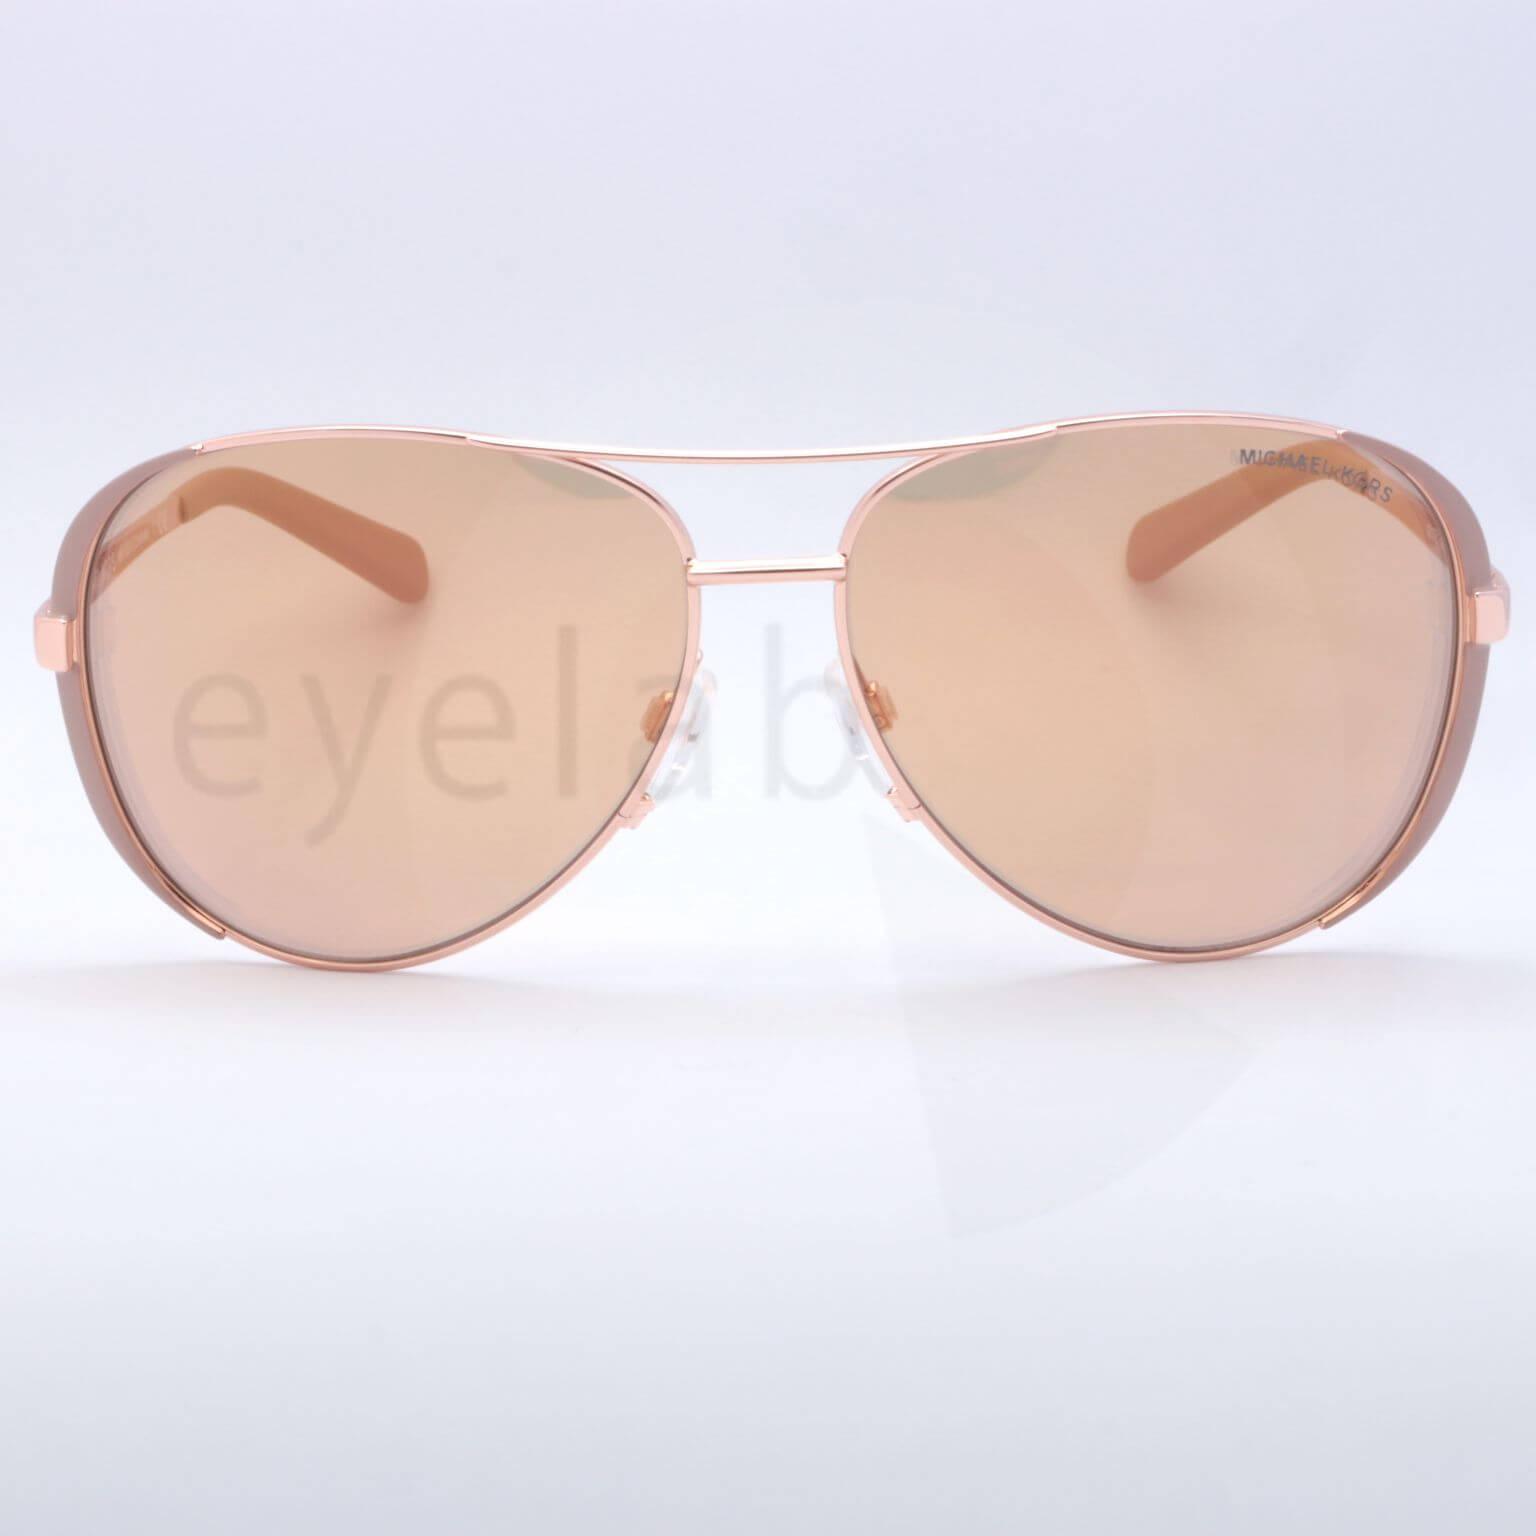 1fa823609c Γυαλιά ηλίου Michael Kors 5004 Chelsea 1017R1 ~ Eyelab